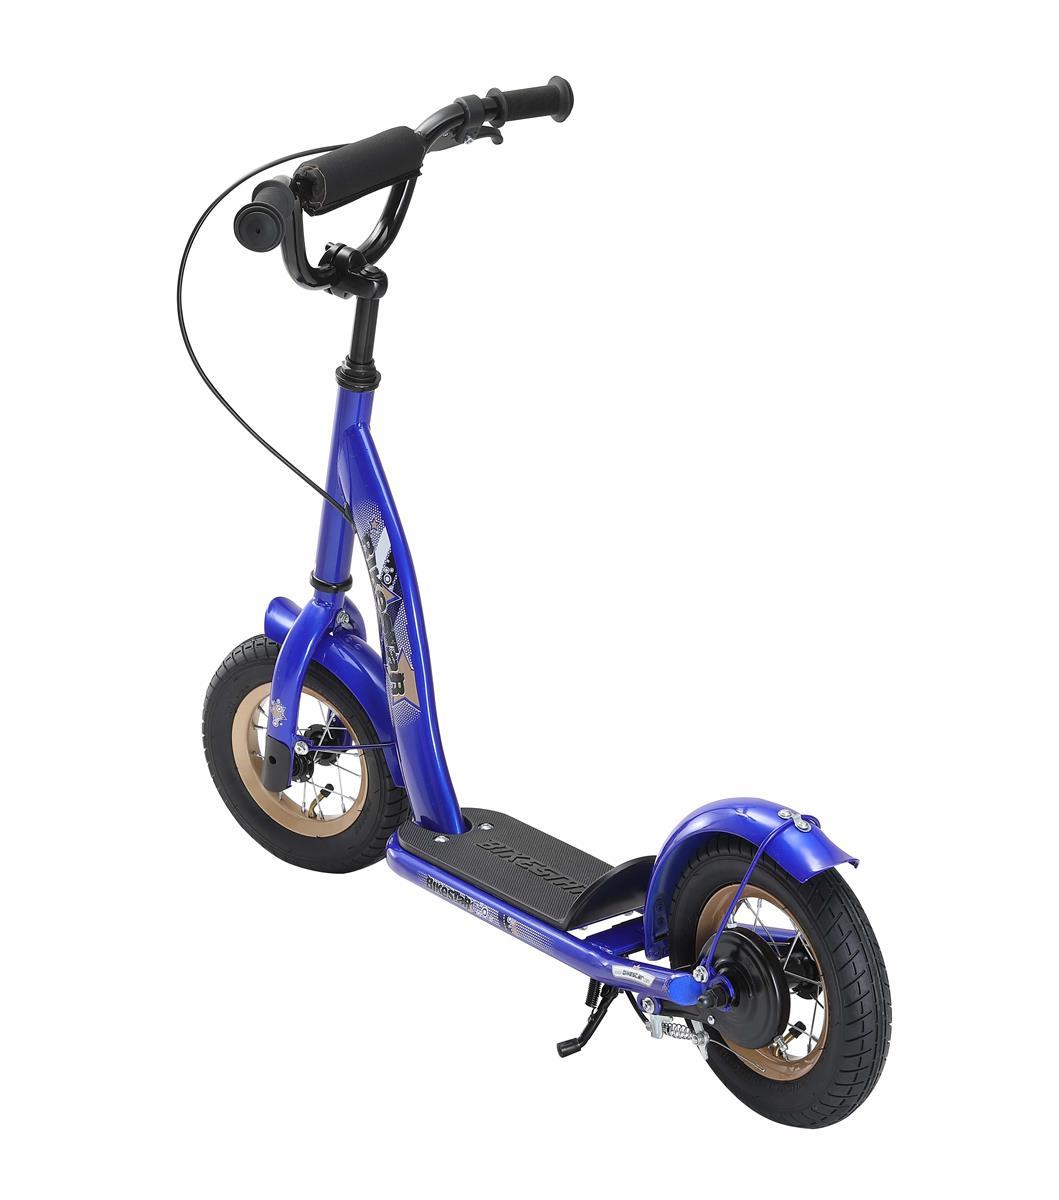 sc 10 kk 01 blue bikestar 10 zoll roller klassik blau. Black Bedroom Furniture Sets. Home Design Ideas